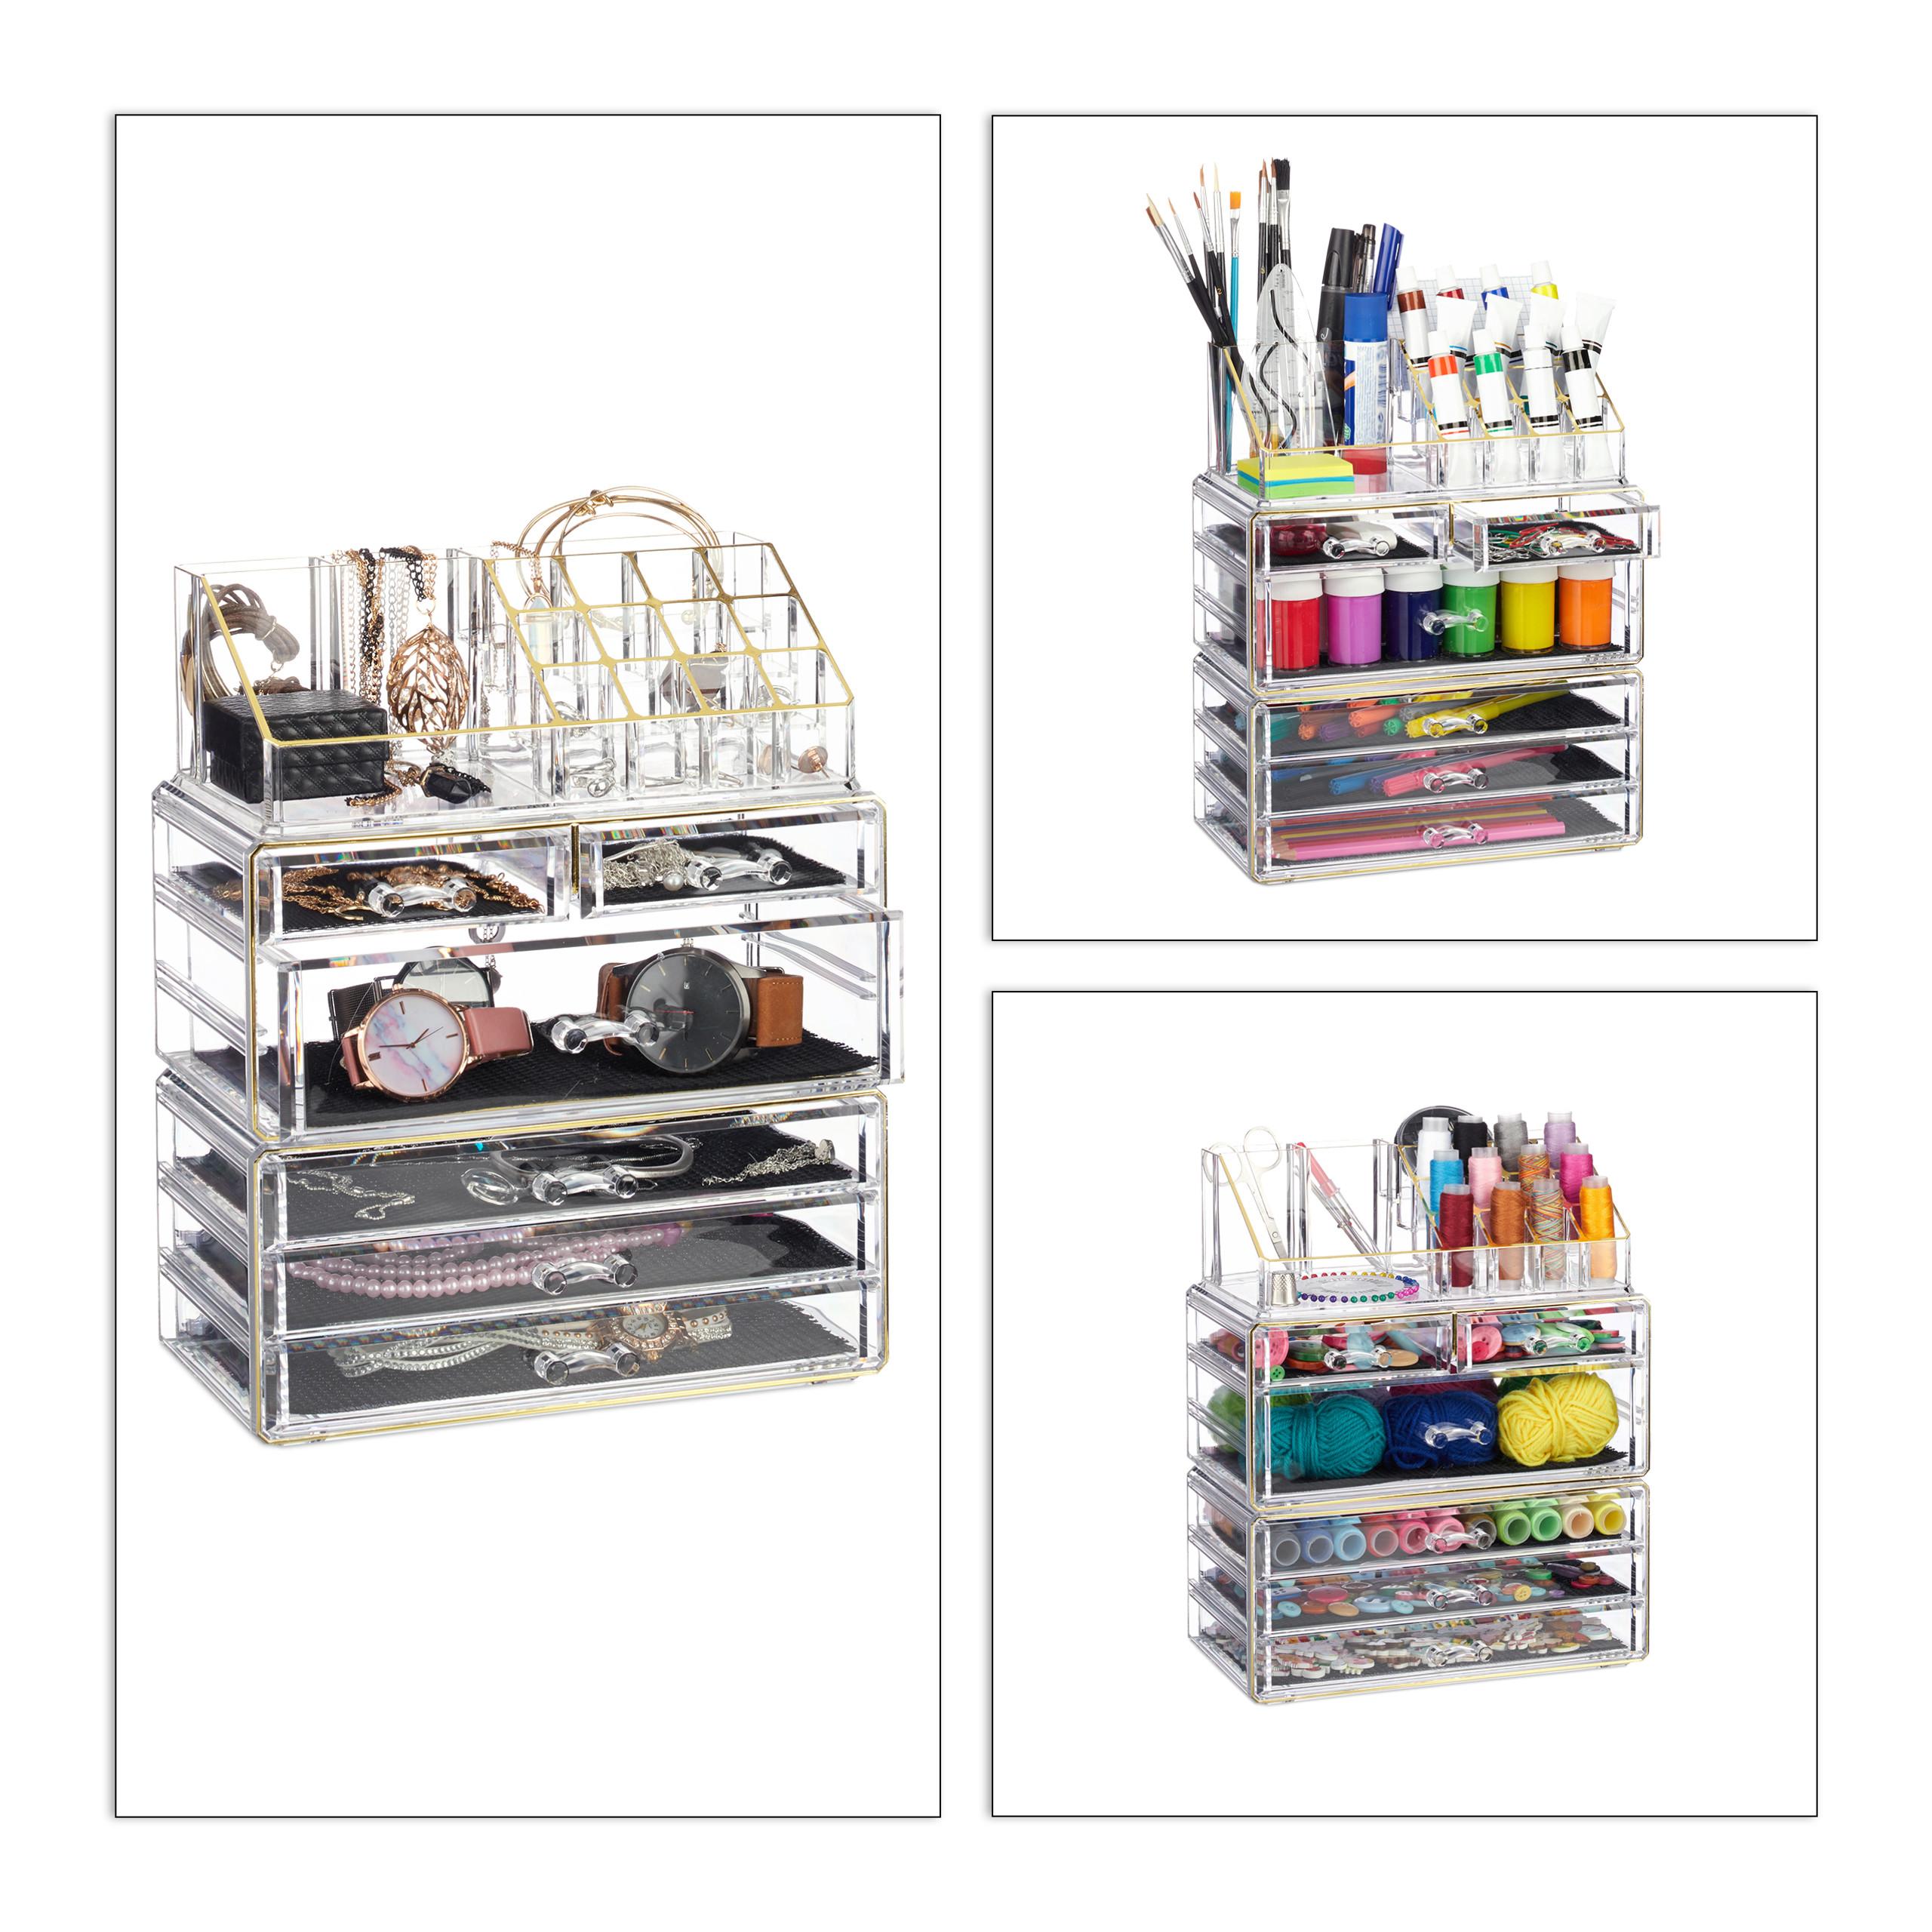 make-up-organizer-met-6-lades-acryl-cosmeticahouder-make-up-cosmetica-opslag miniatuur 12